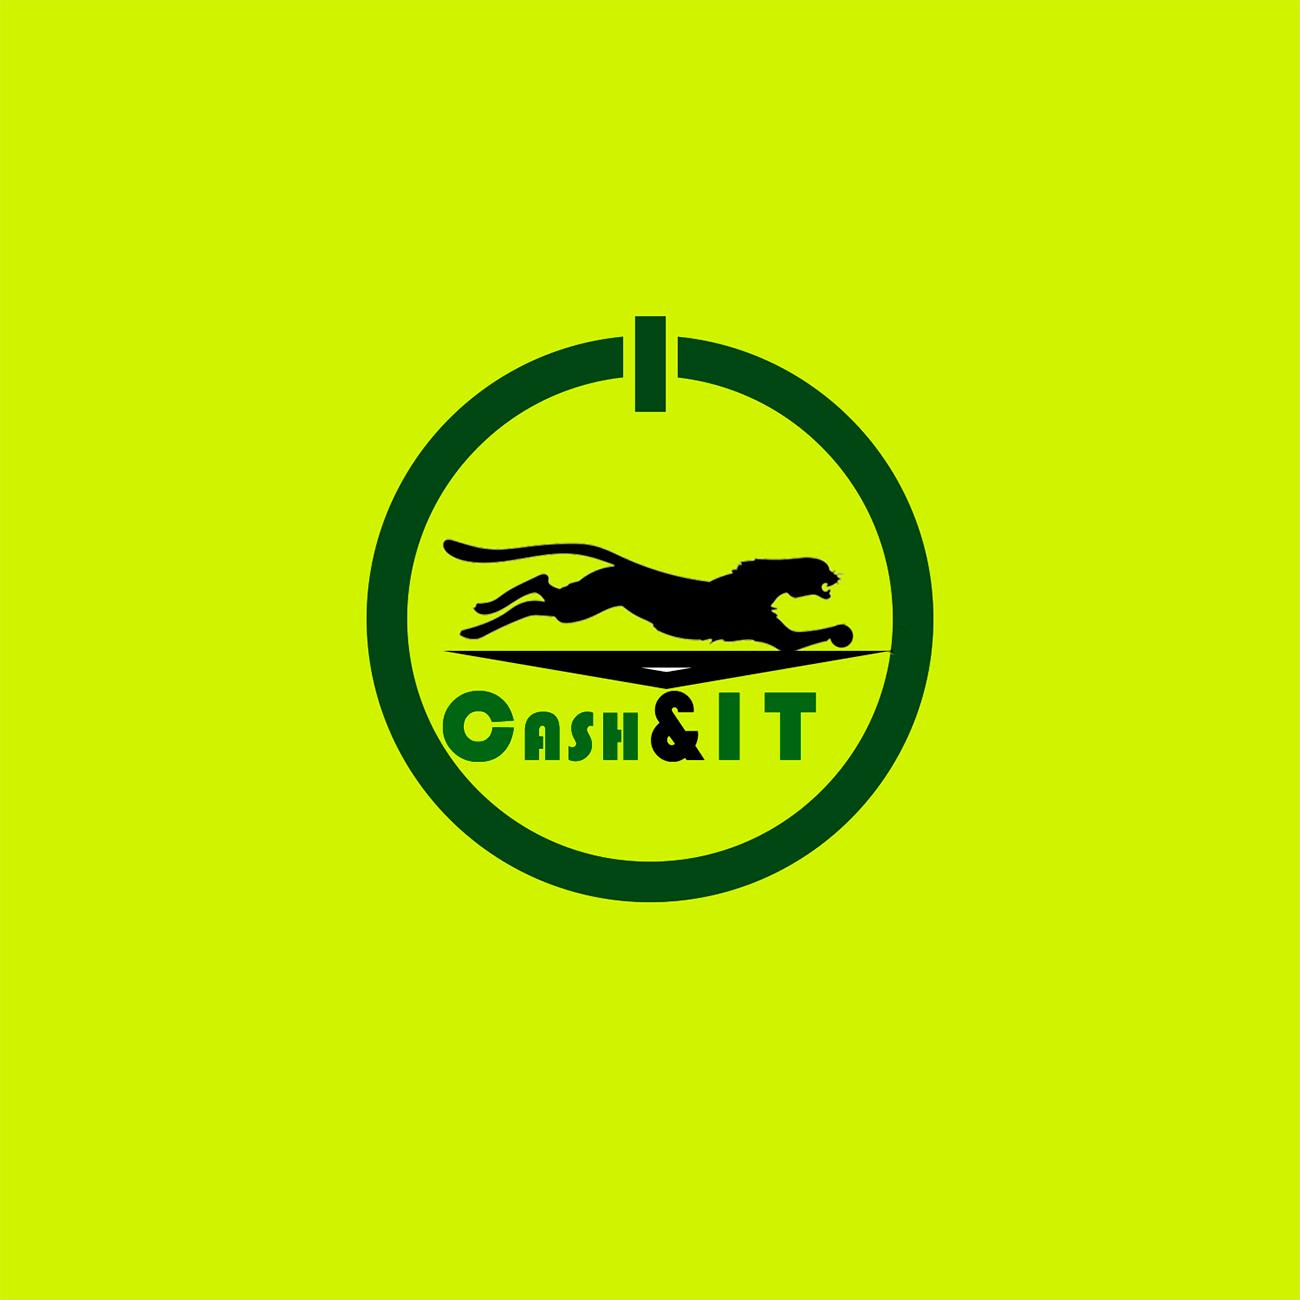 Логотип для Cash & IT - сервис доставки денег фото f_3435fdf6a2dcdf1c.jpg